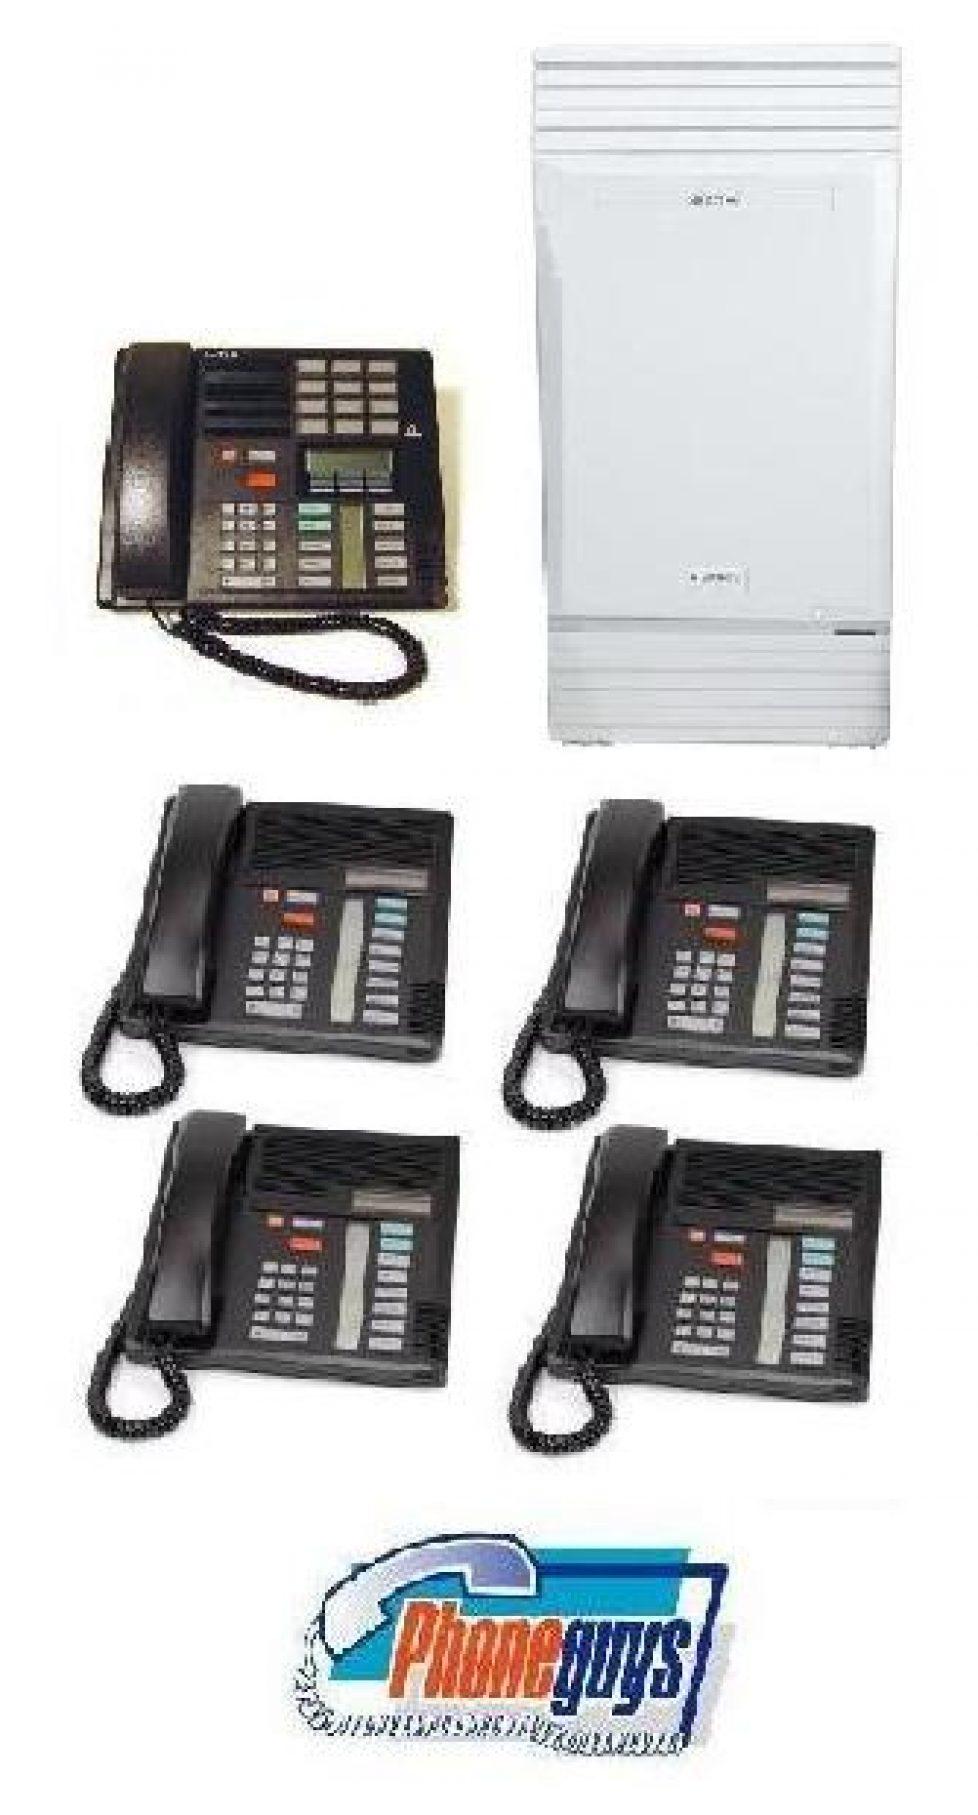 Modular ICS with 1-M7310 4-M7208 Phones